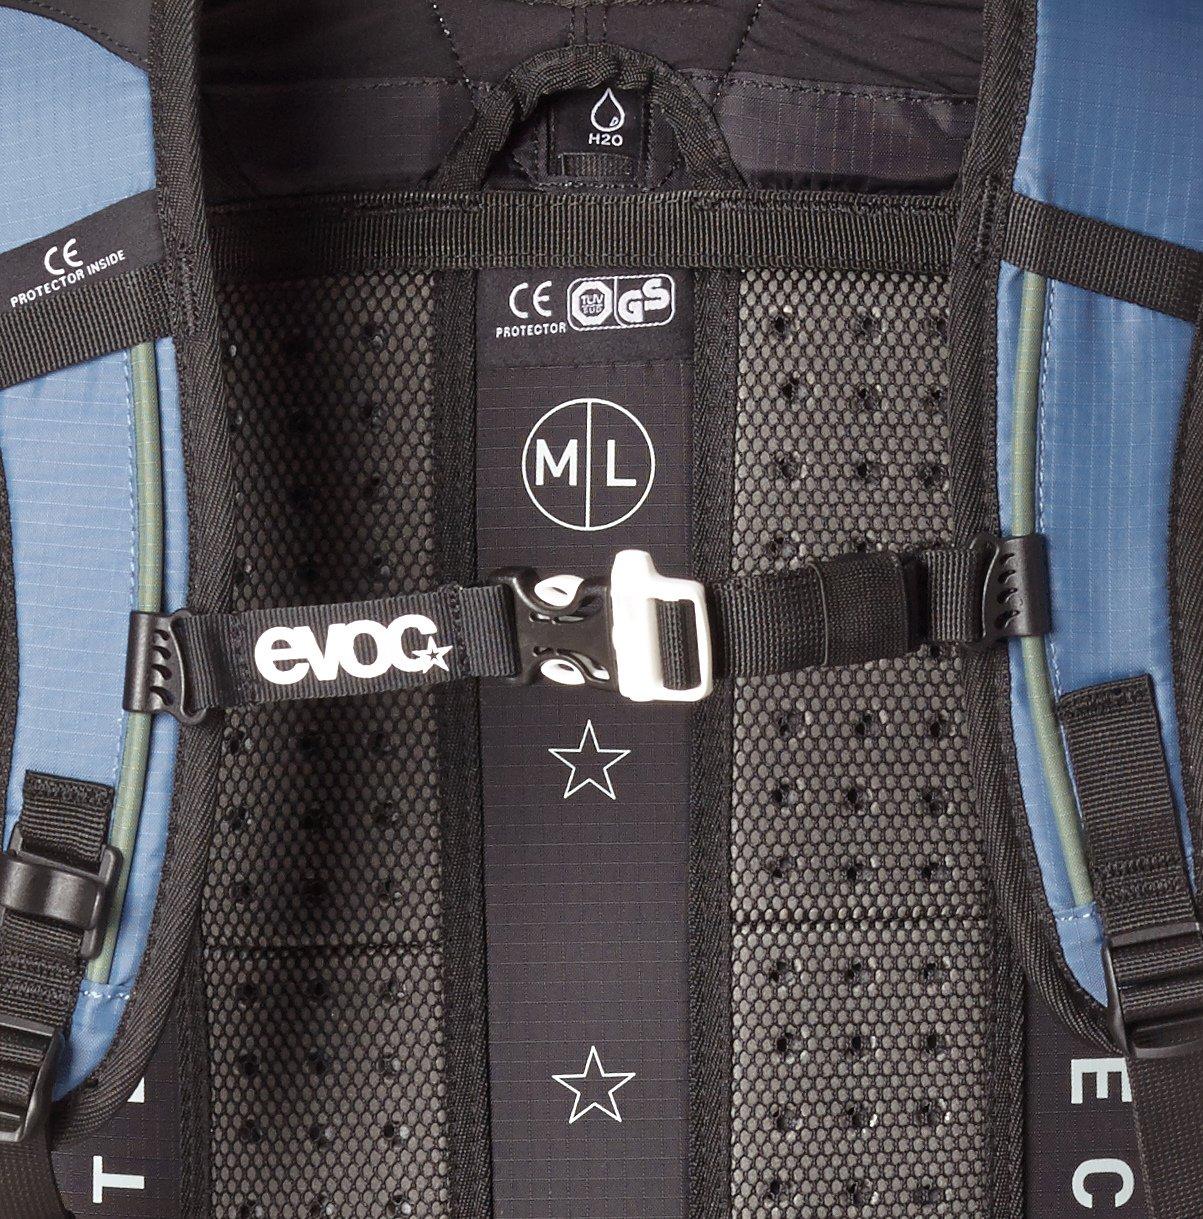 EVOC FR Enduro Team 16L B016DEJ106 Trekkingruckscke Karamell, Karamell, Karamell, sanft 1ec115